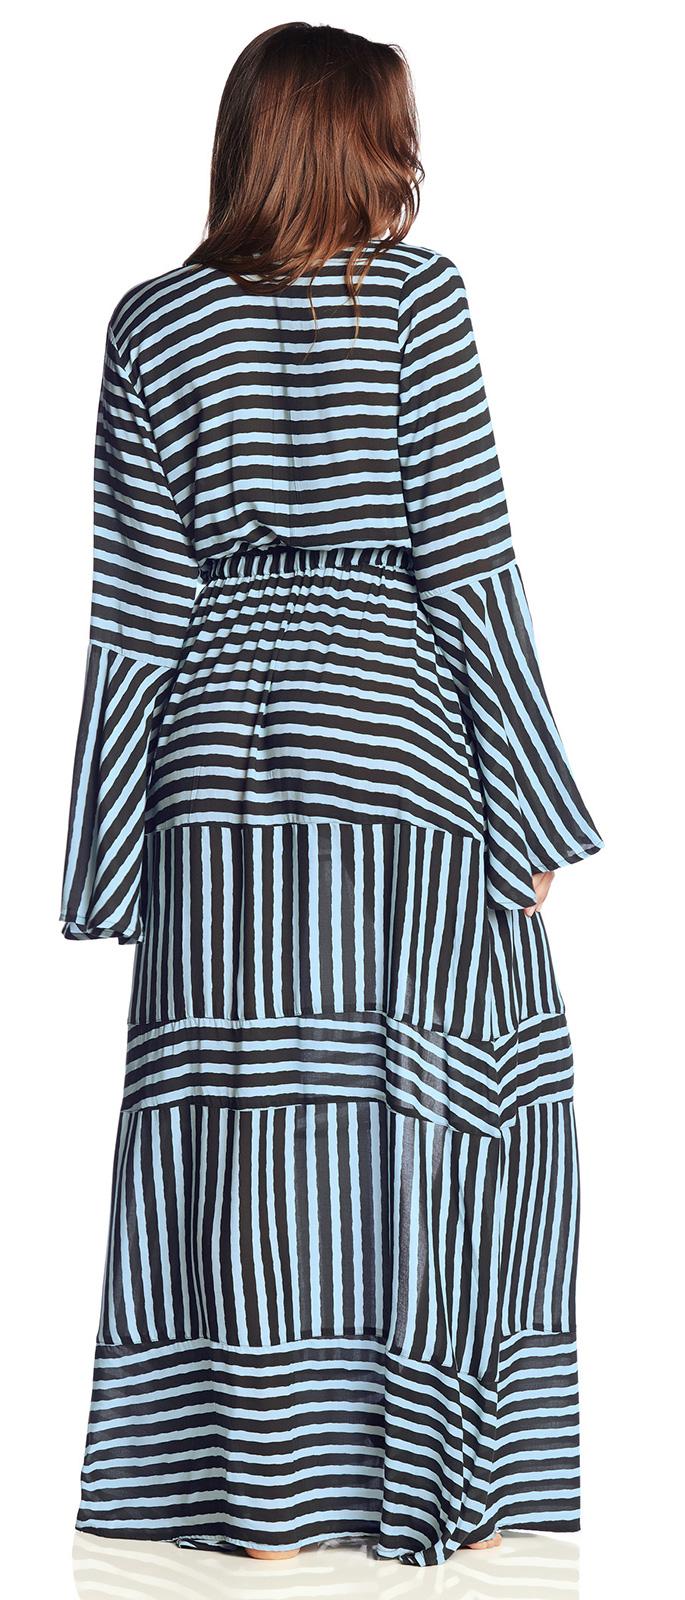 8e57d2abef Maxi Dresses Long Beach Dress In Strappy Print - Million Memories